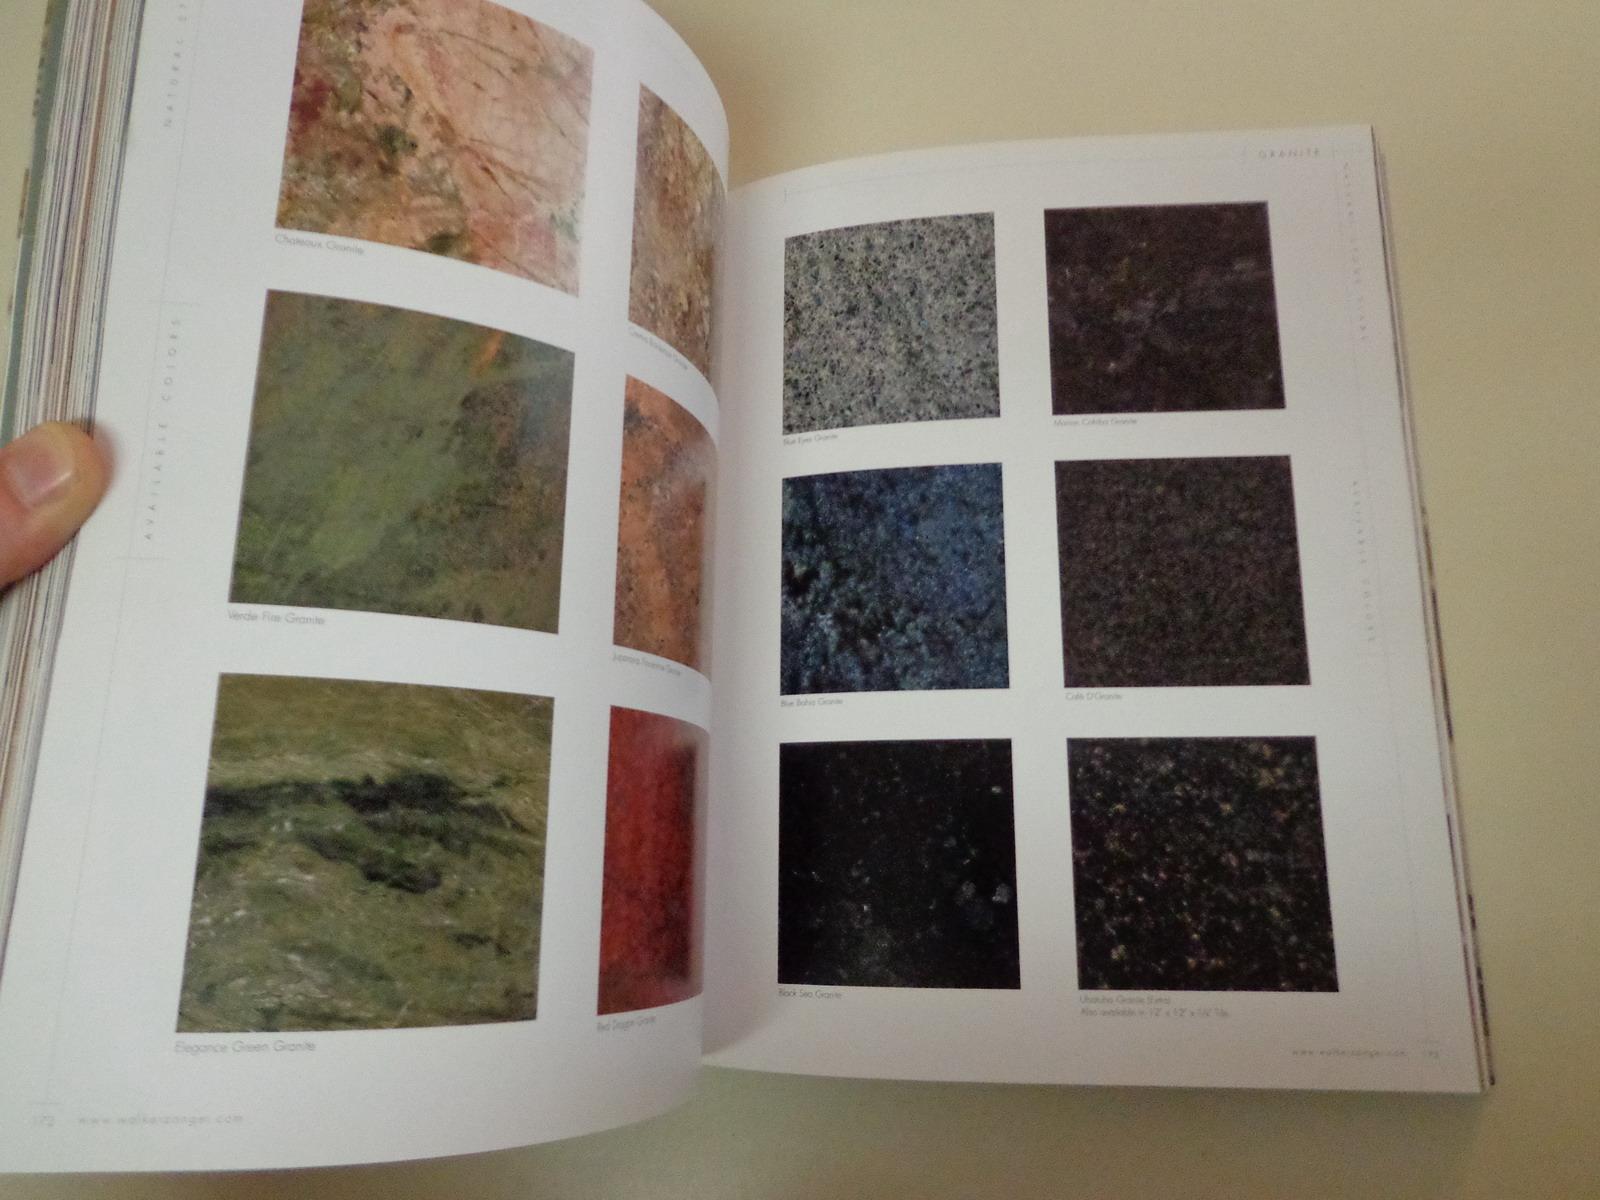 Walker zanger stone and tile catalog 2005 interior design - Design home interiors montgomeryville ...